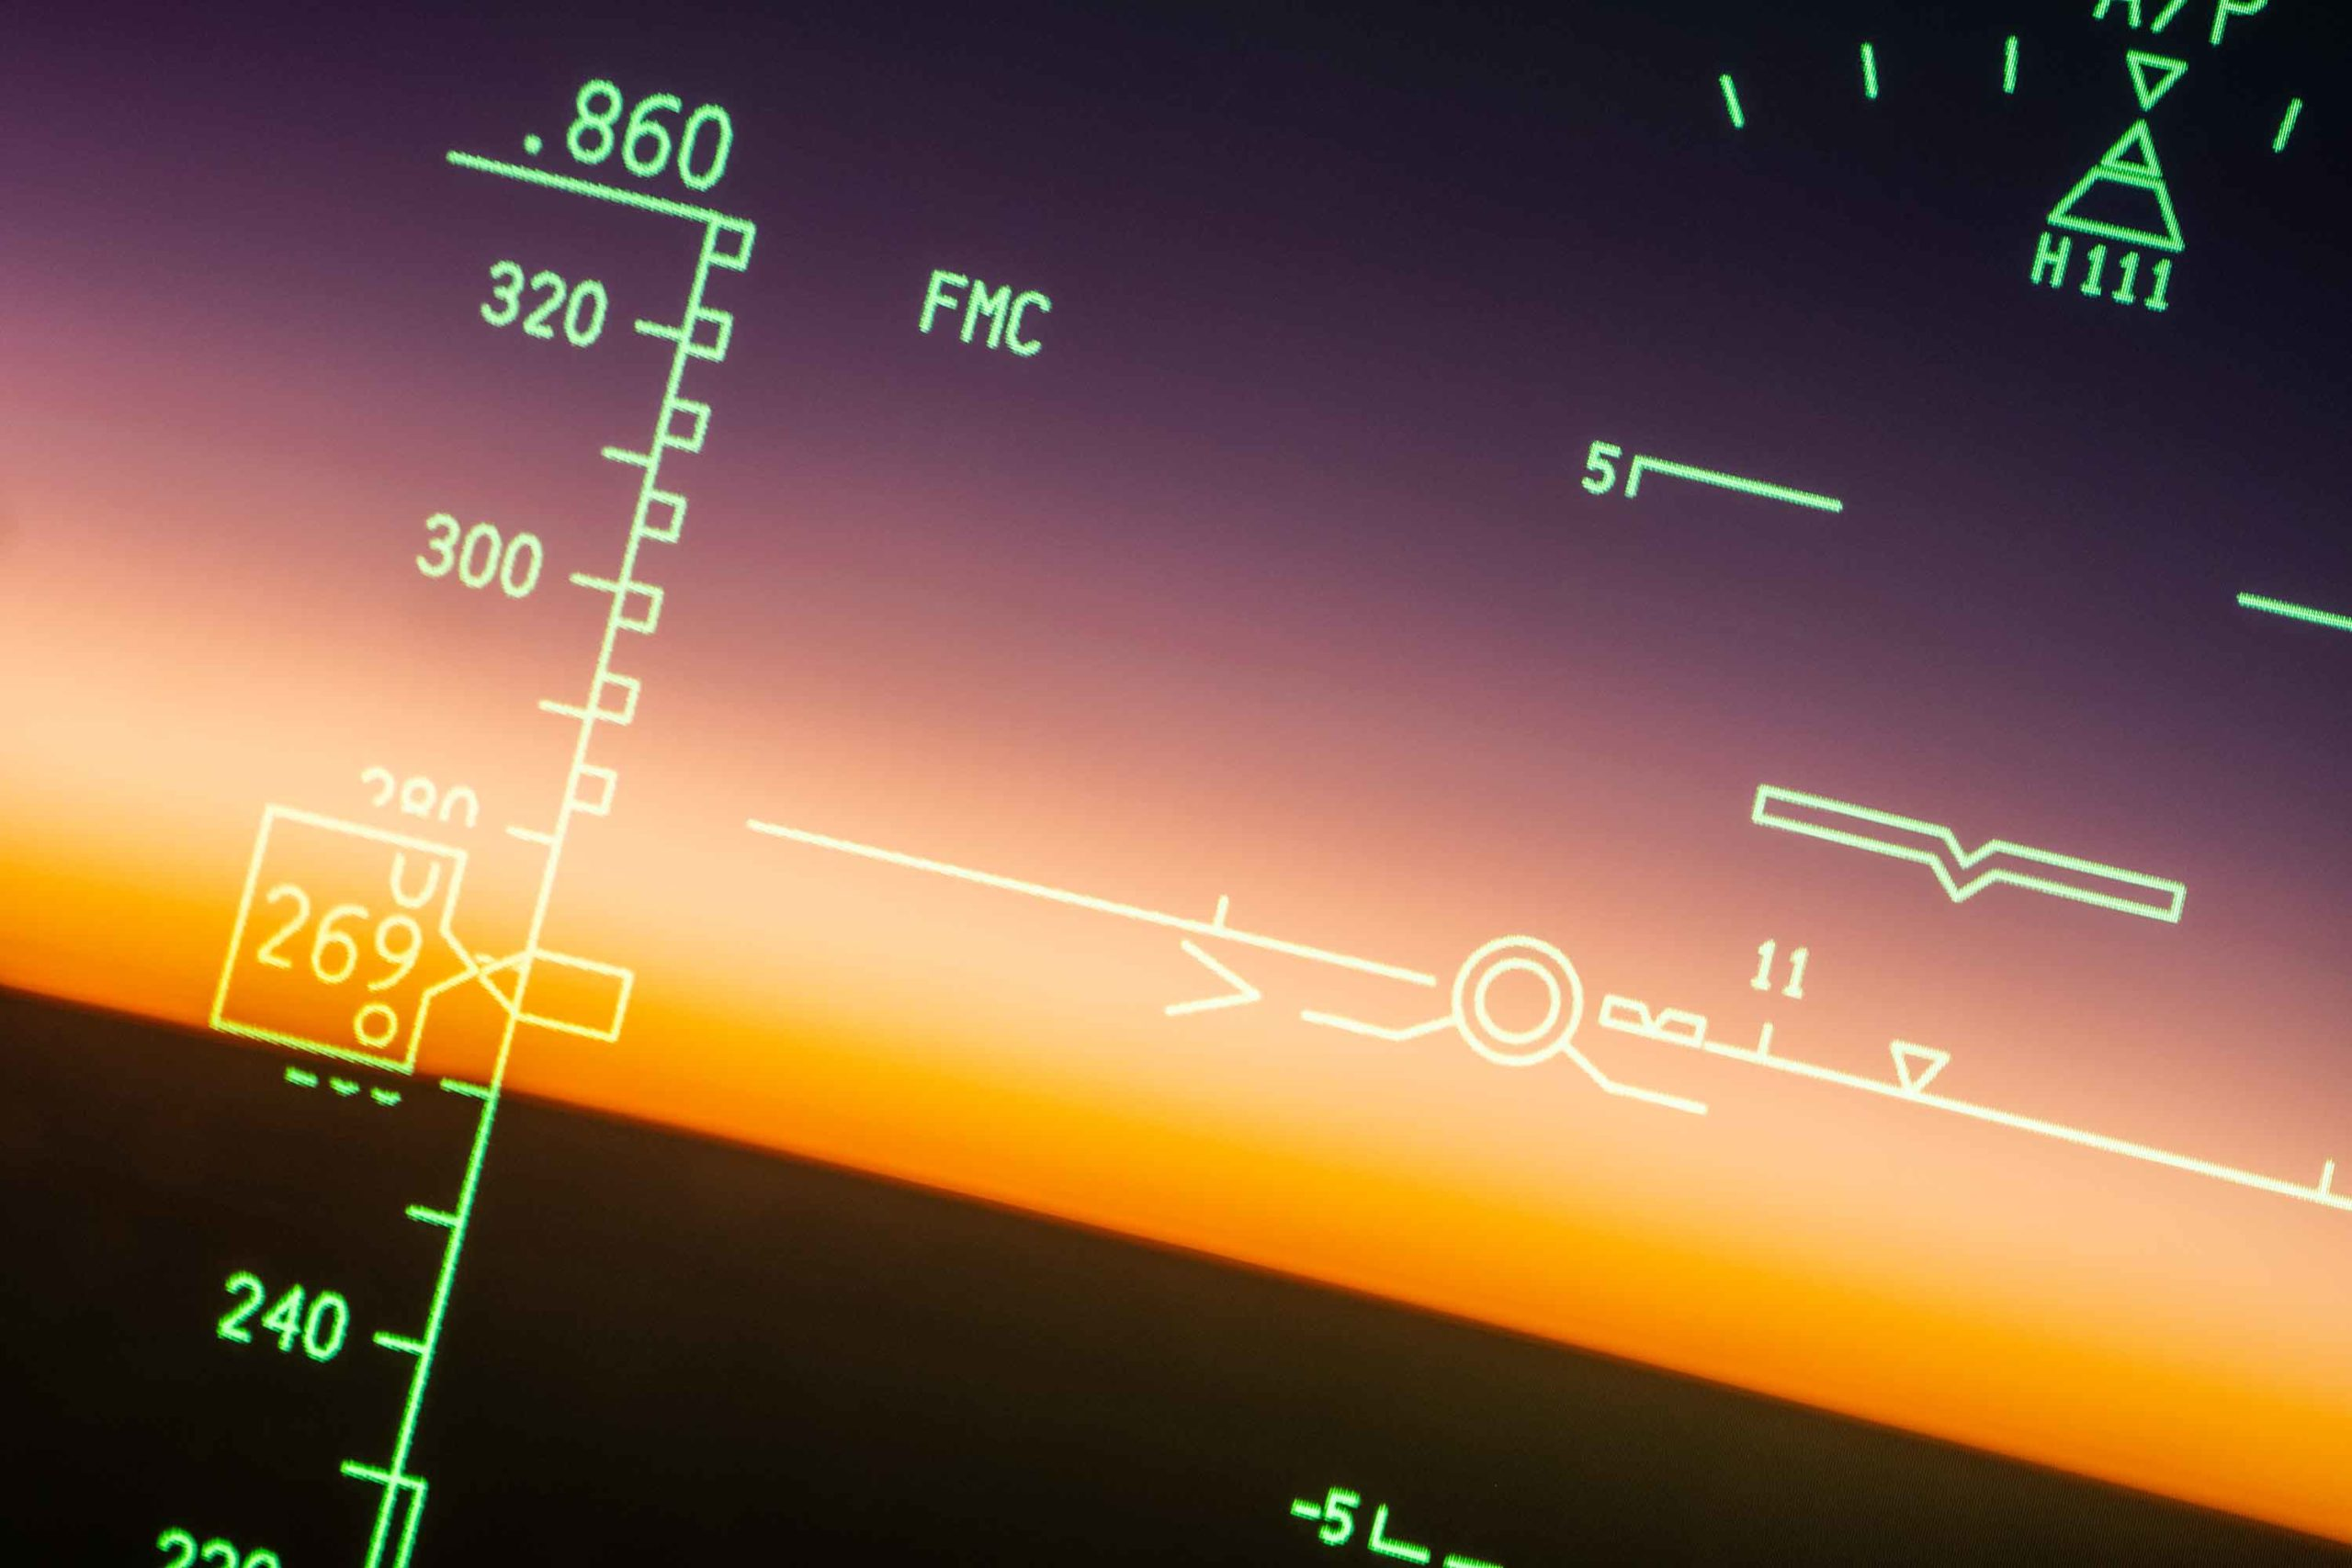 Boeing 787 Dreamliner HUD